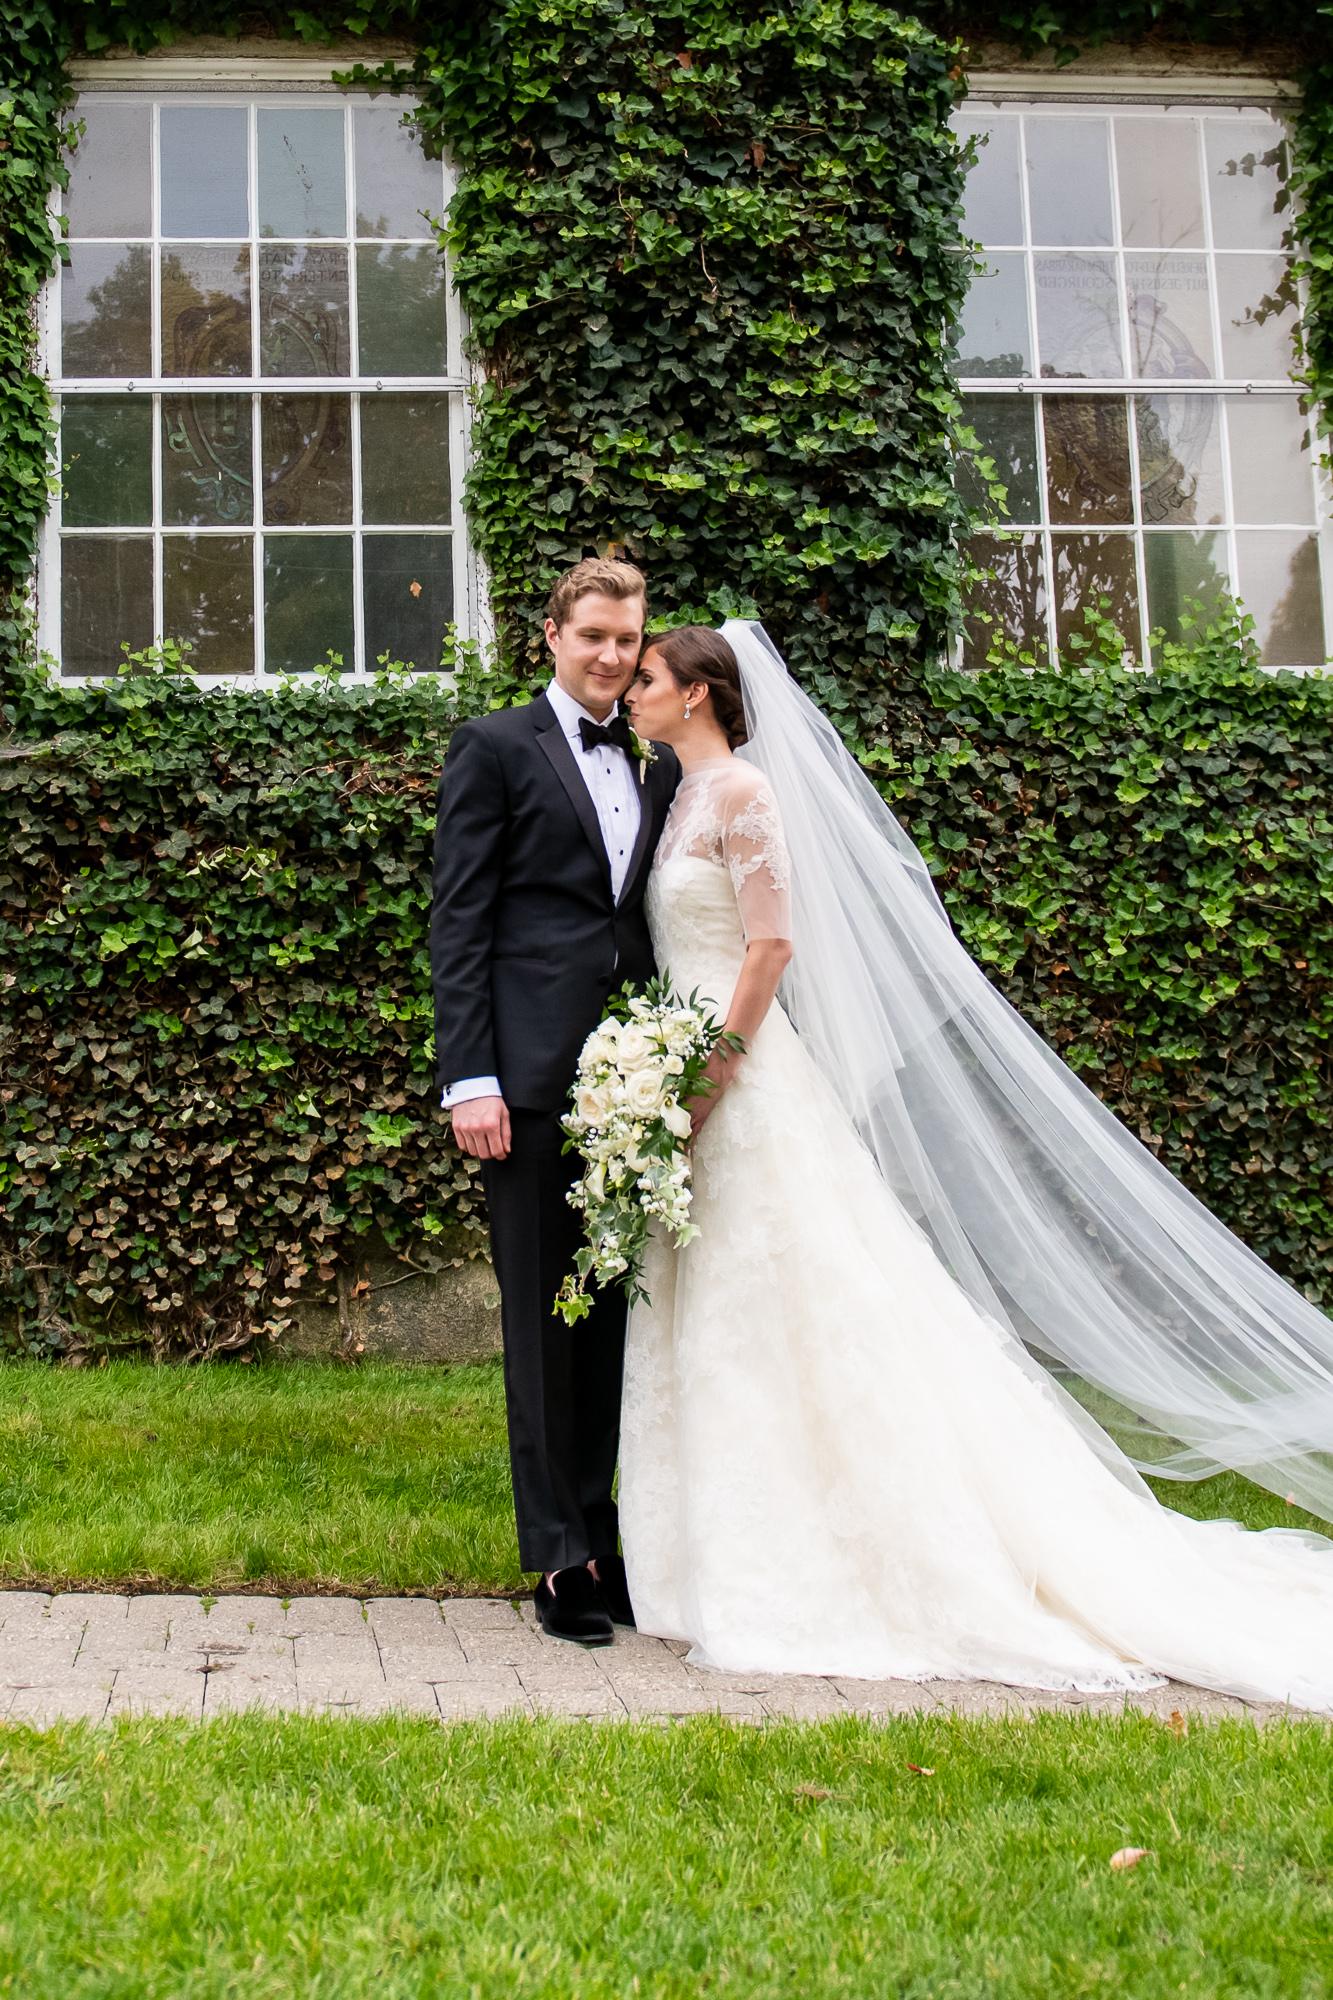 Shauna & Jake's Ridgewood Country Club Wedding; photos by Christopher Duggan